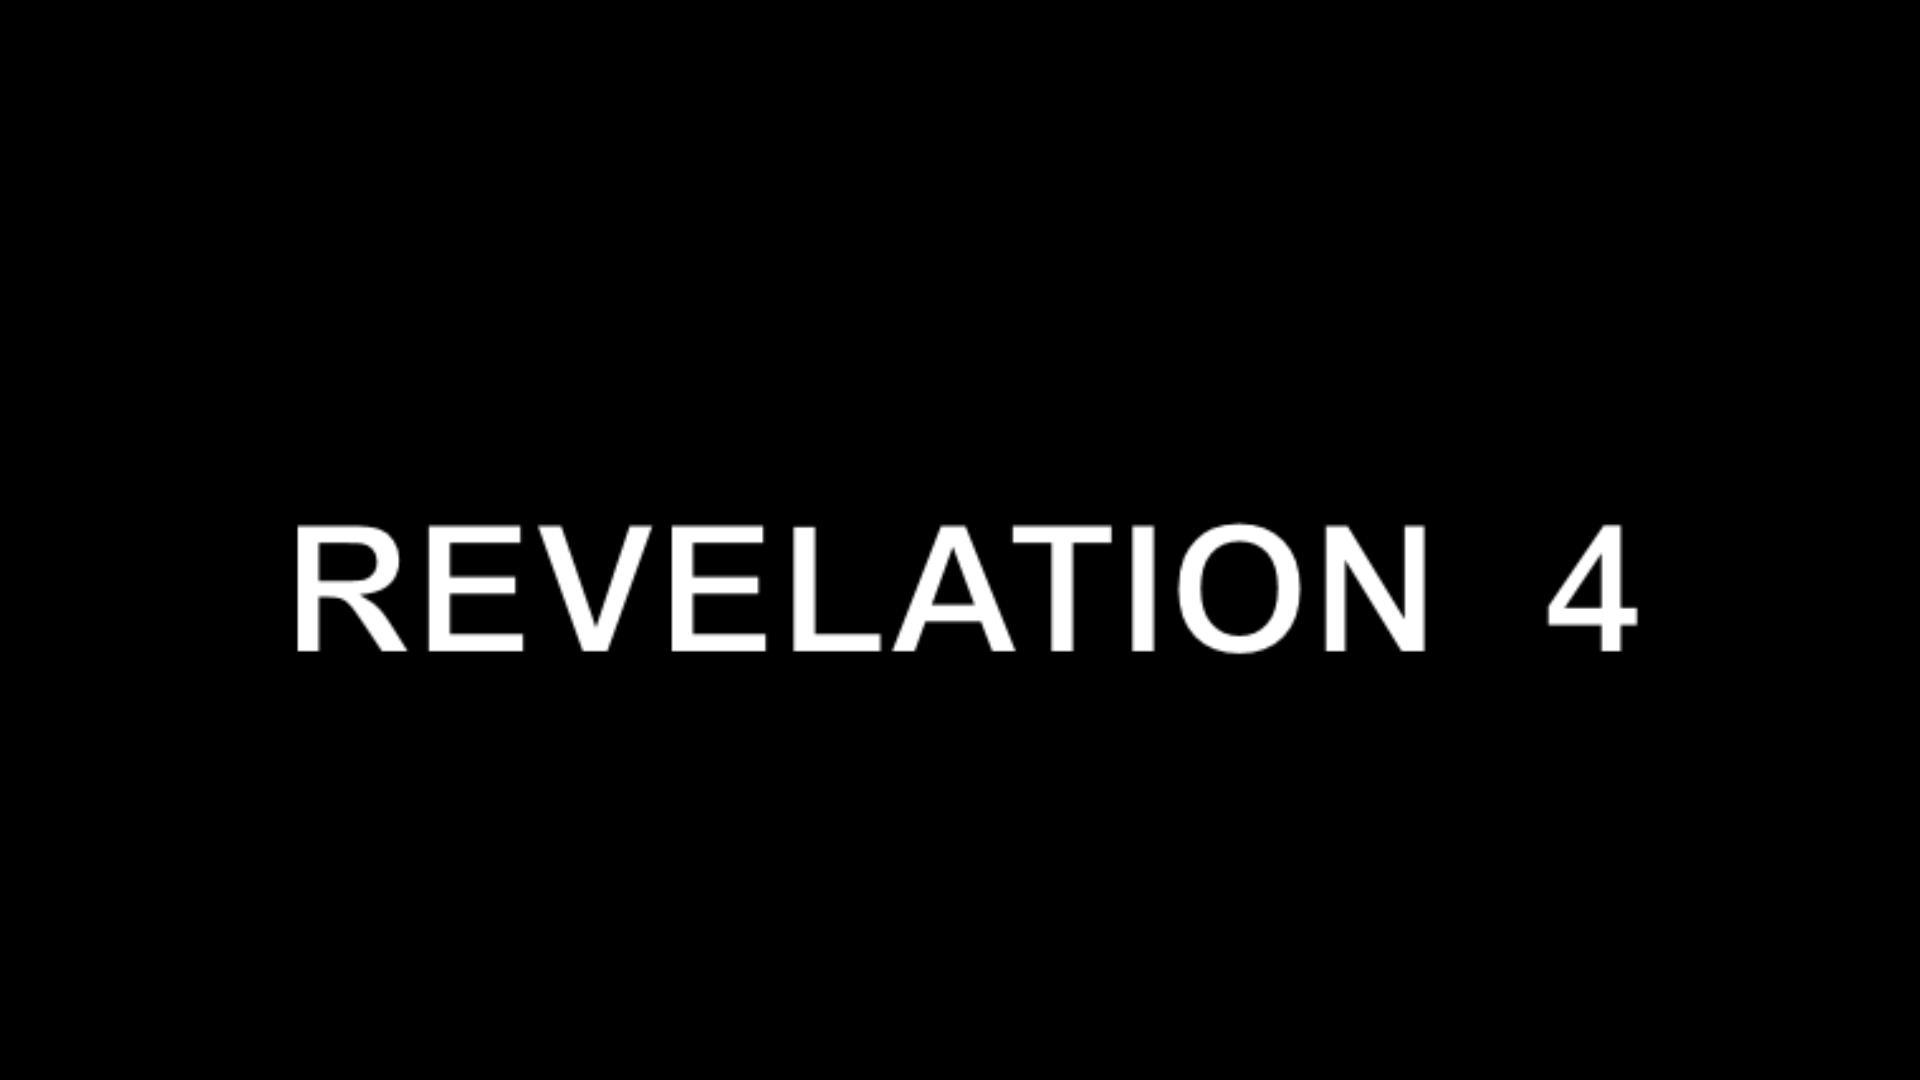 Revelation 4